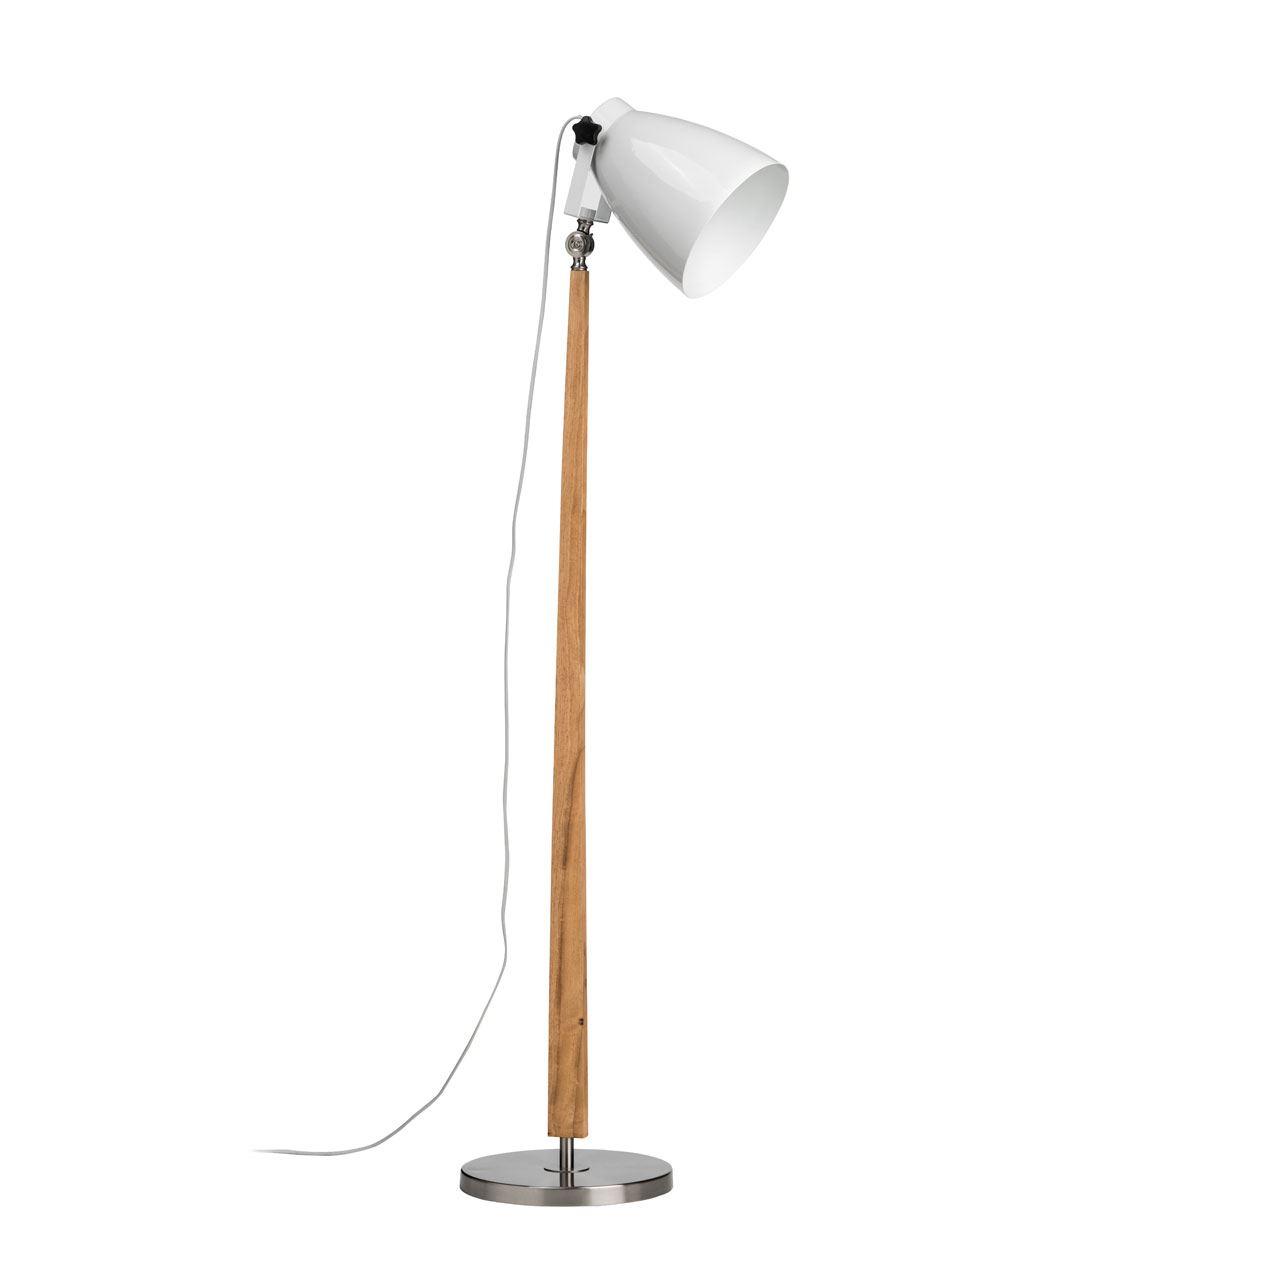 Stockholm Floor Lamp, Satin Nickel / Light Wood, White Shade